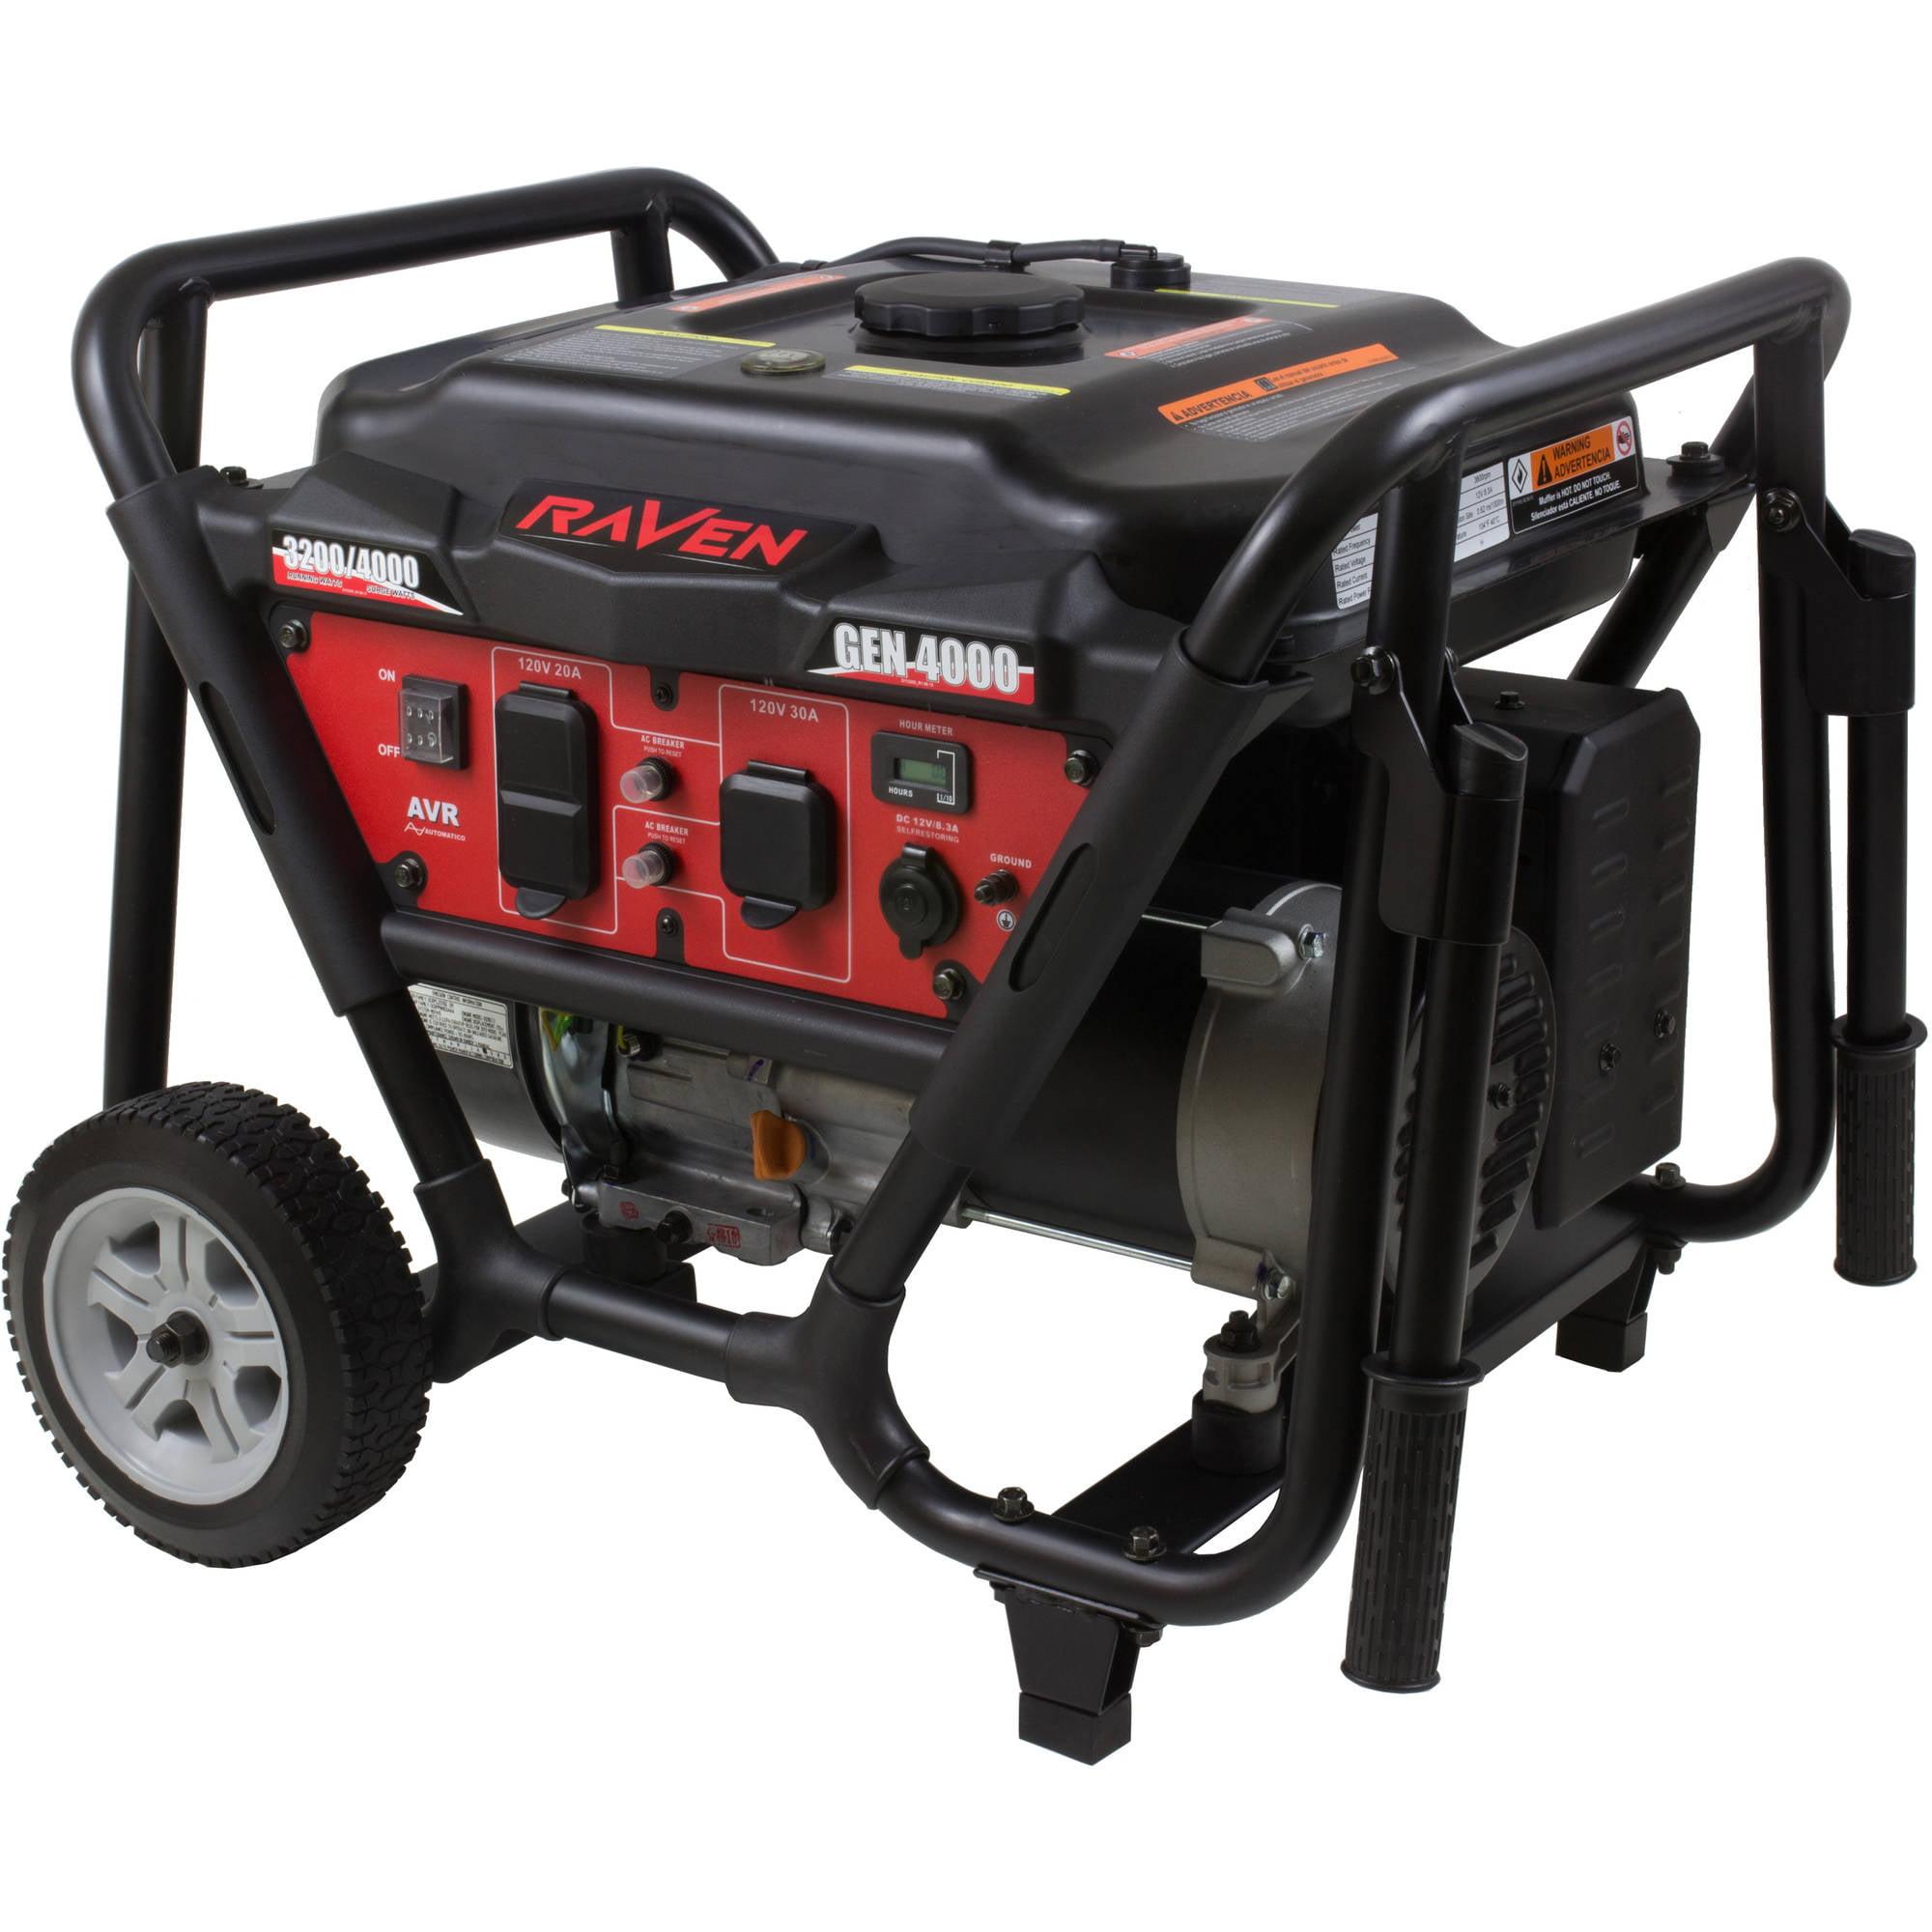 Raven 4000 Watt Generator with Wheel Kit Walmart